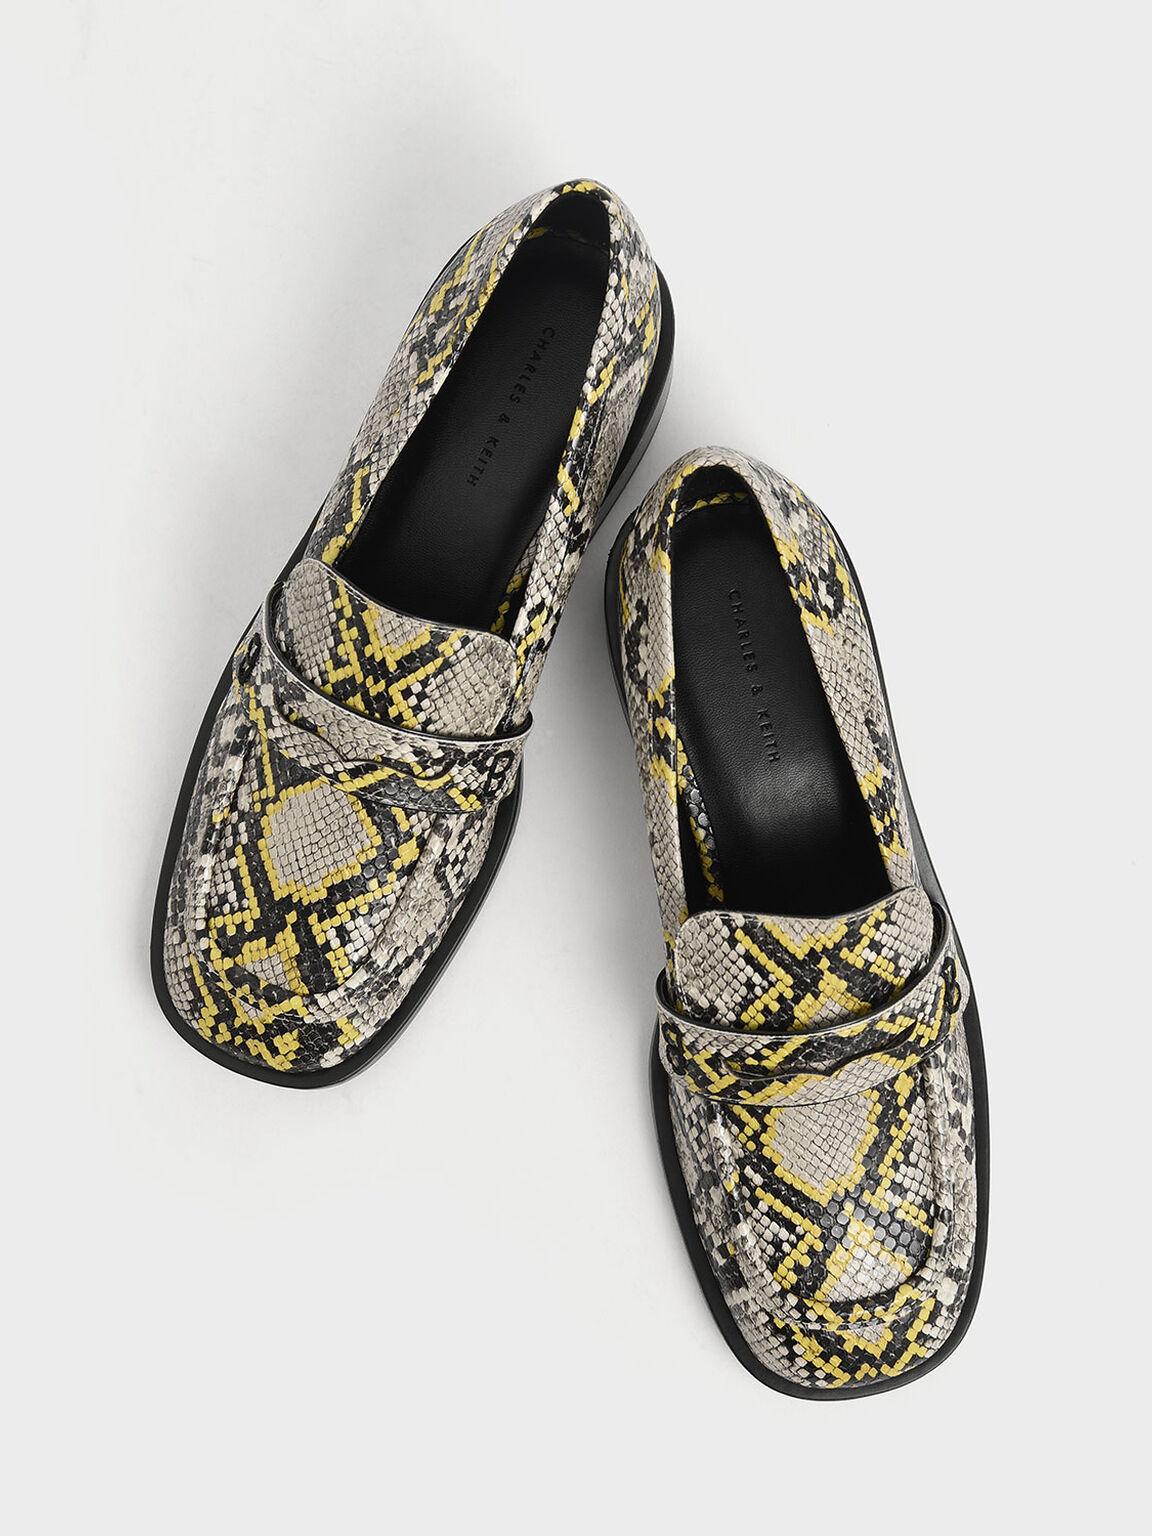 Snake Print Penny Loafers, Multi, hi-res